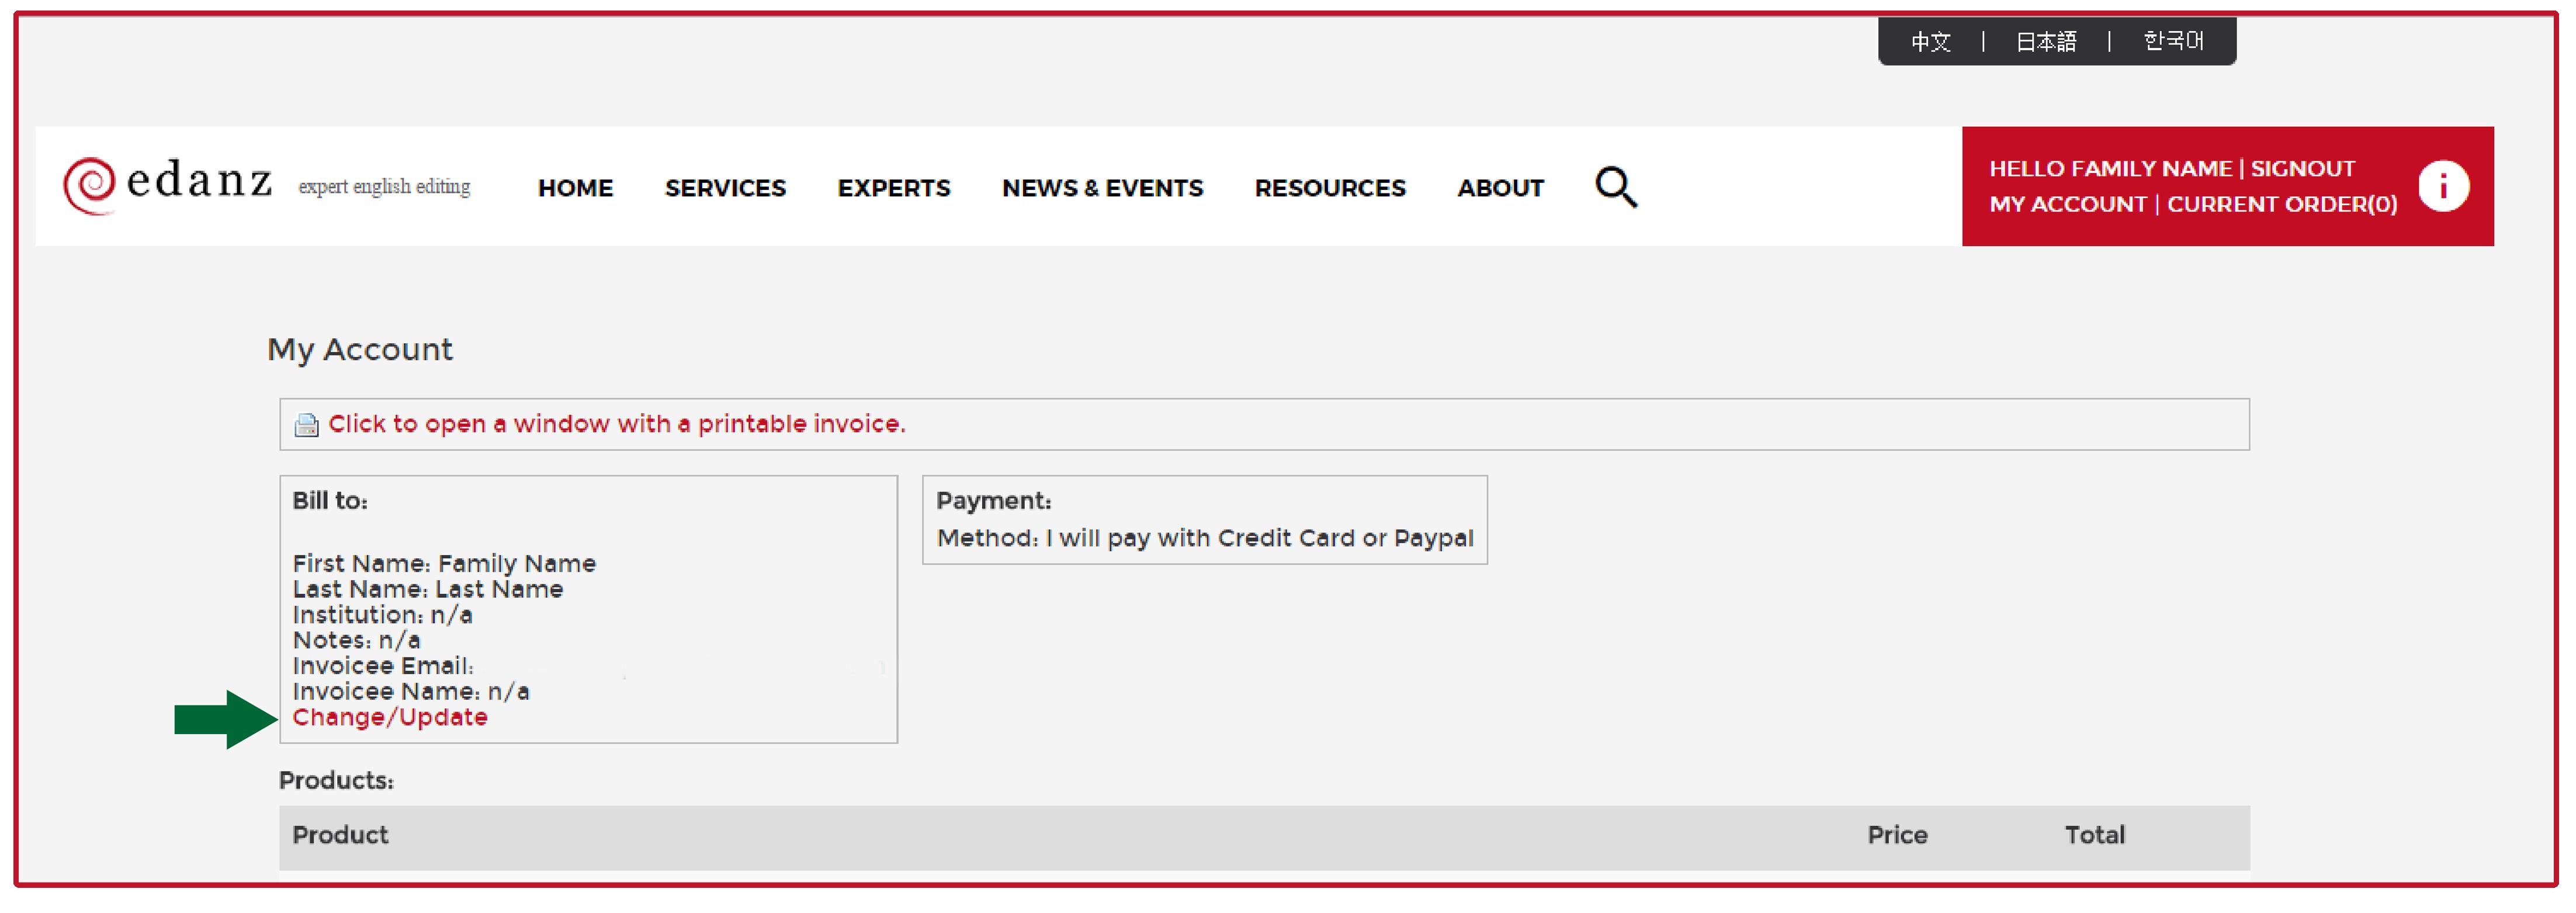 edanz payment change